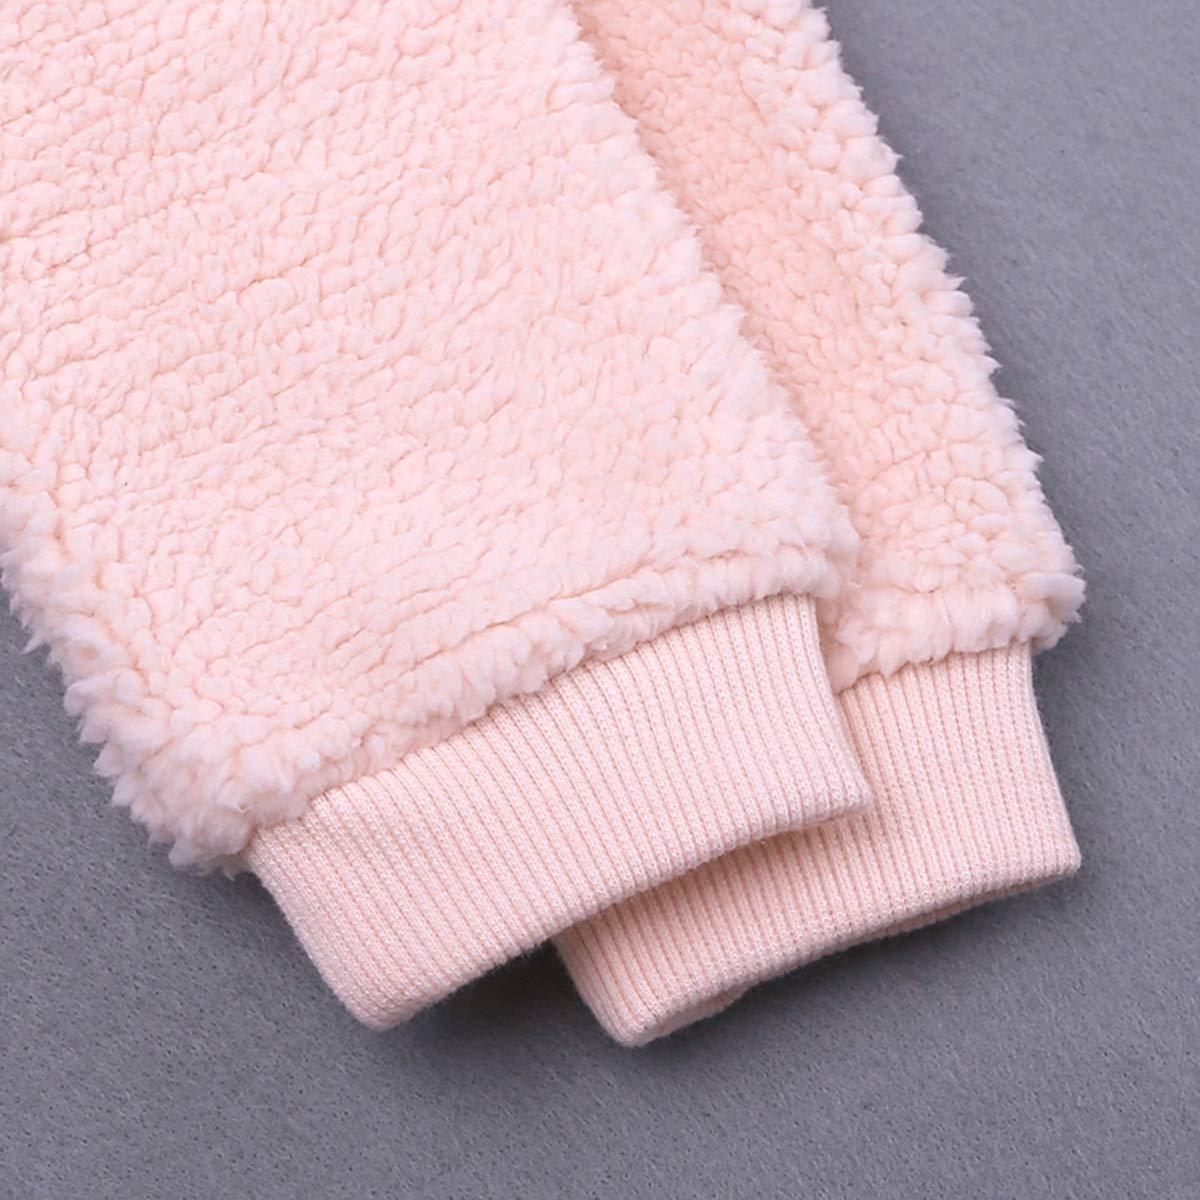 Infant Baby Girls Boys Fleece Hoodie Jacket Coat Winter Warm Cardigan with Ears